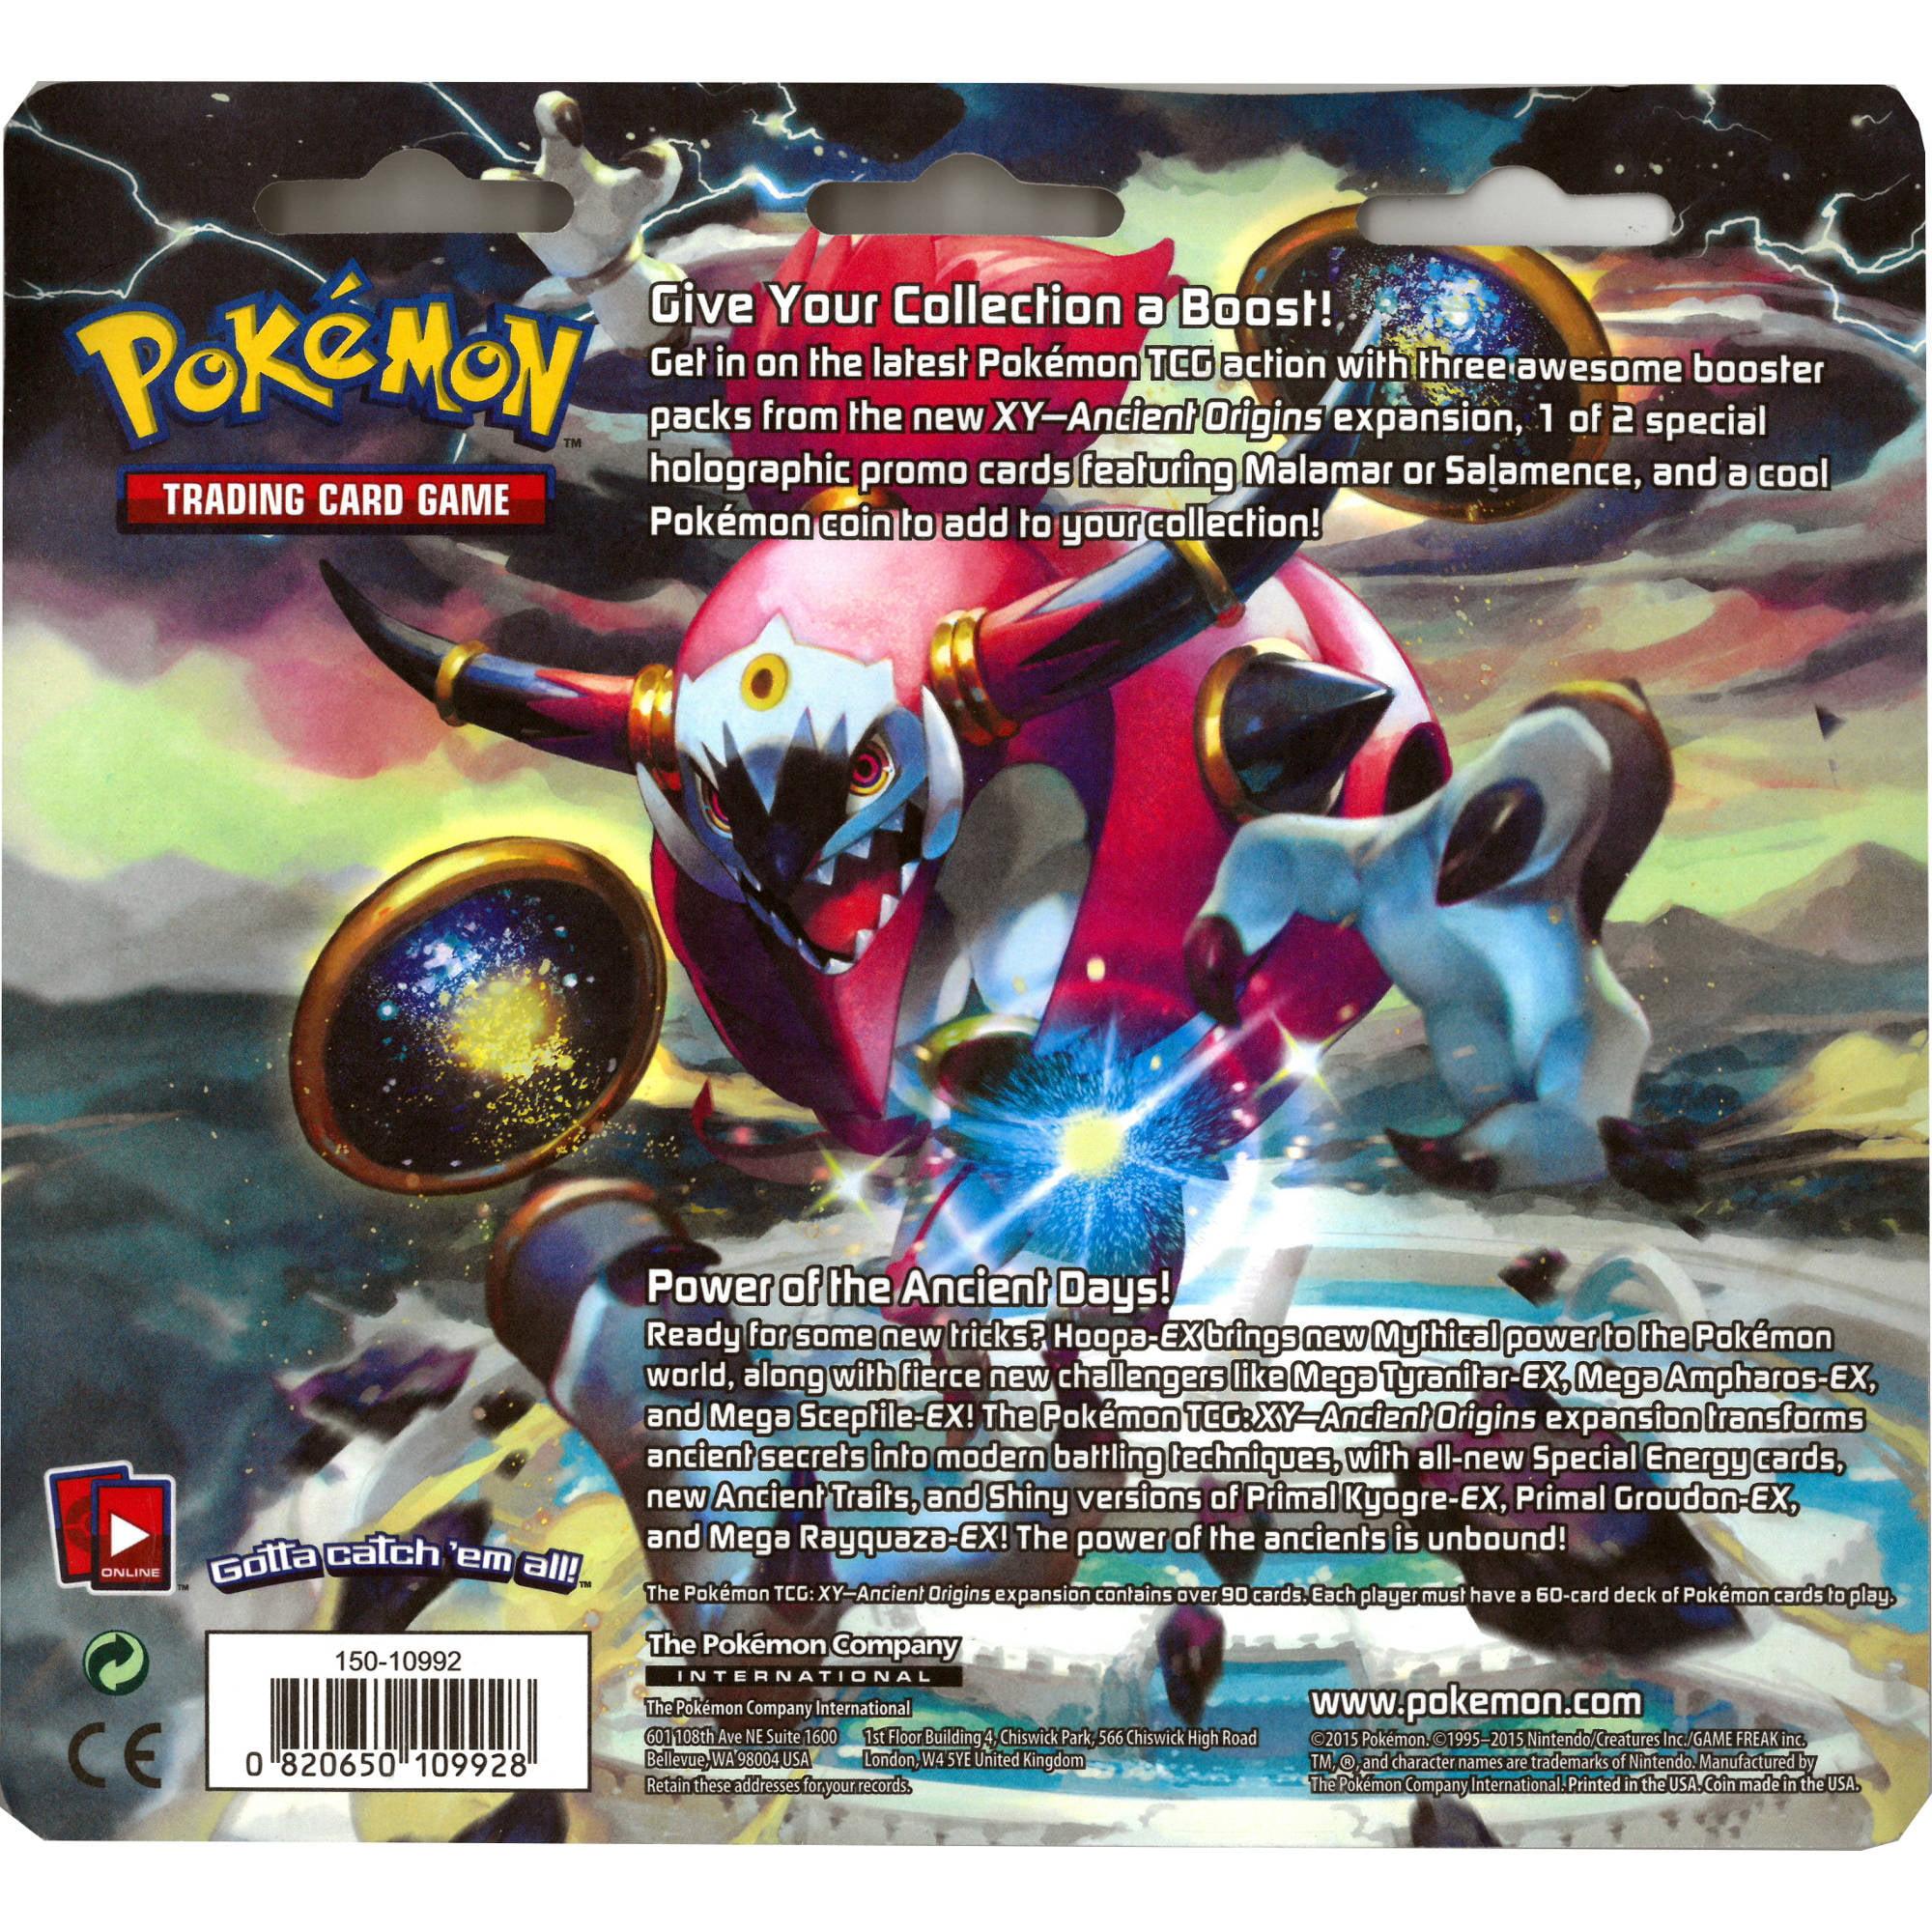 Primal Kyogre Card Pokemon Xy 7 Ancient Origins Double Blister 3Pk  Walmart